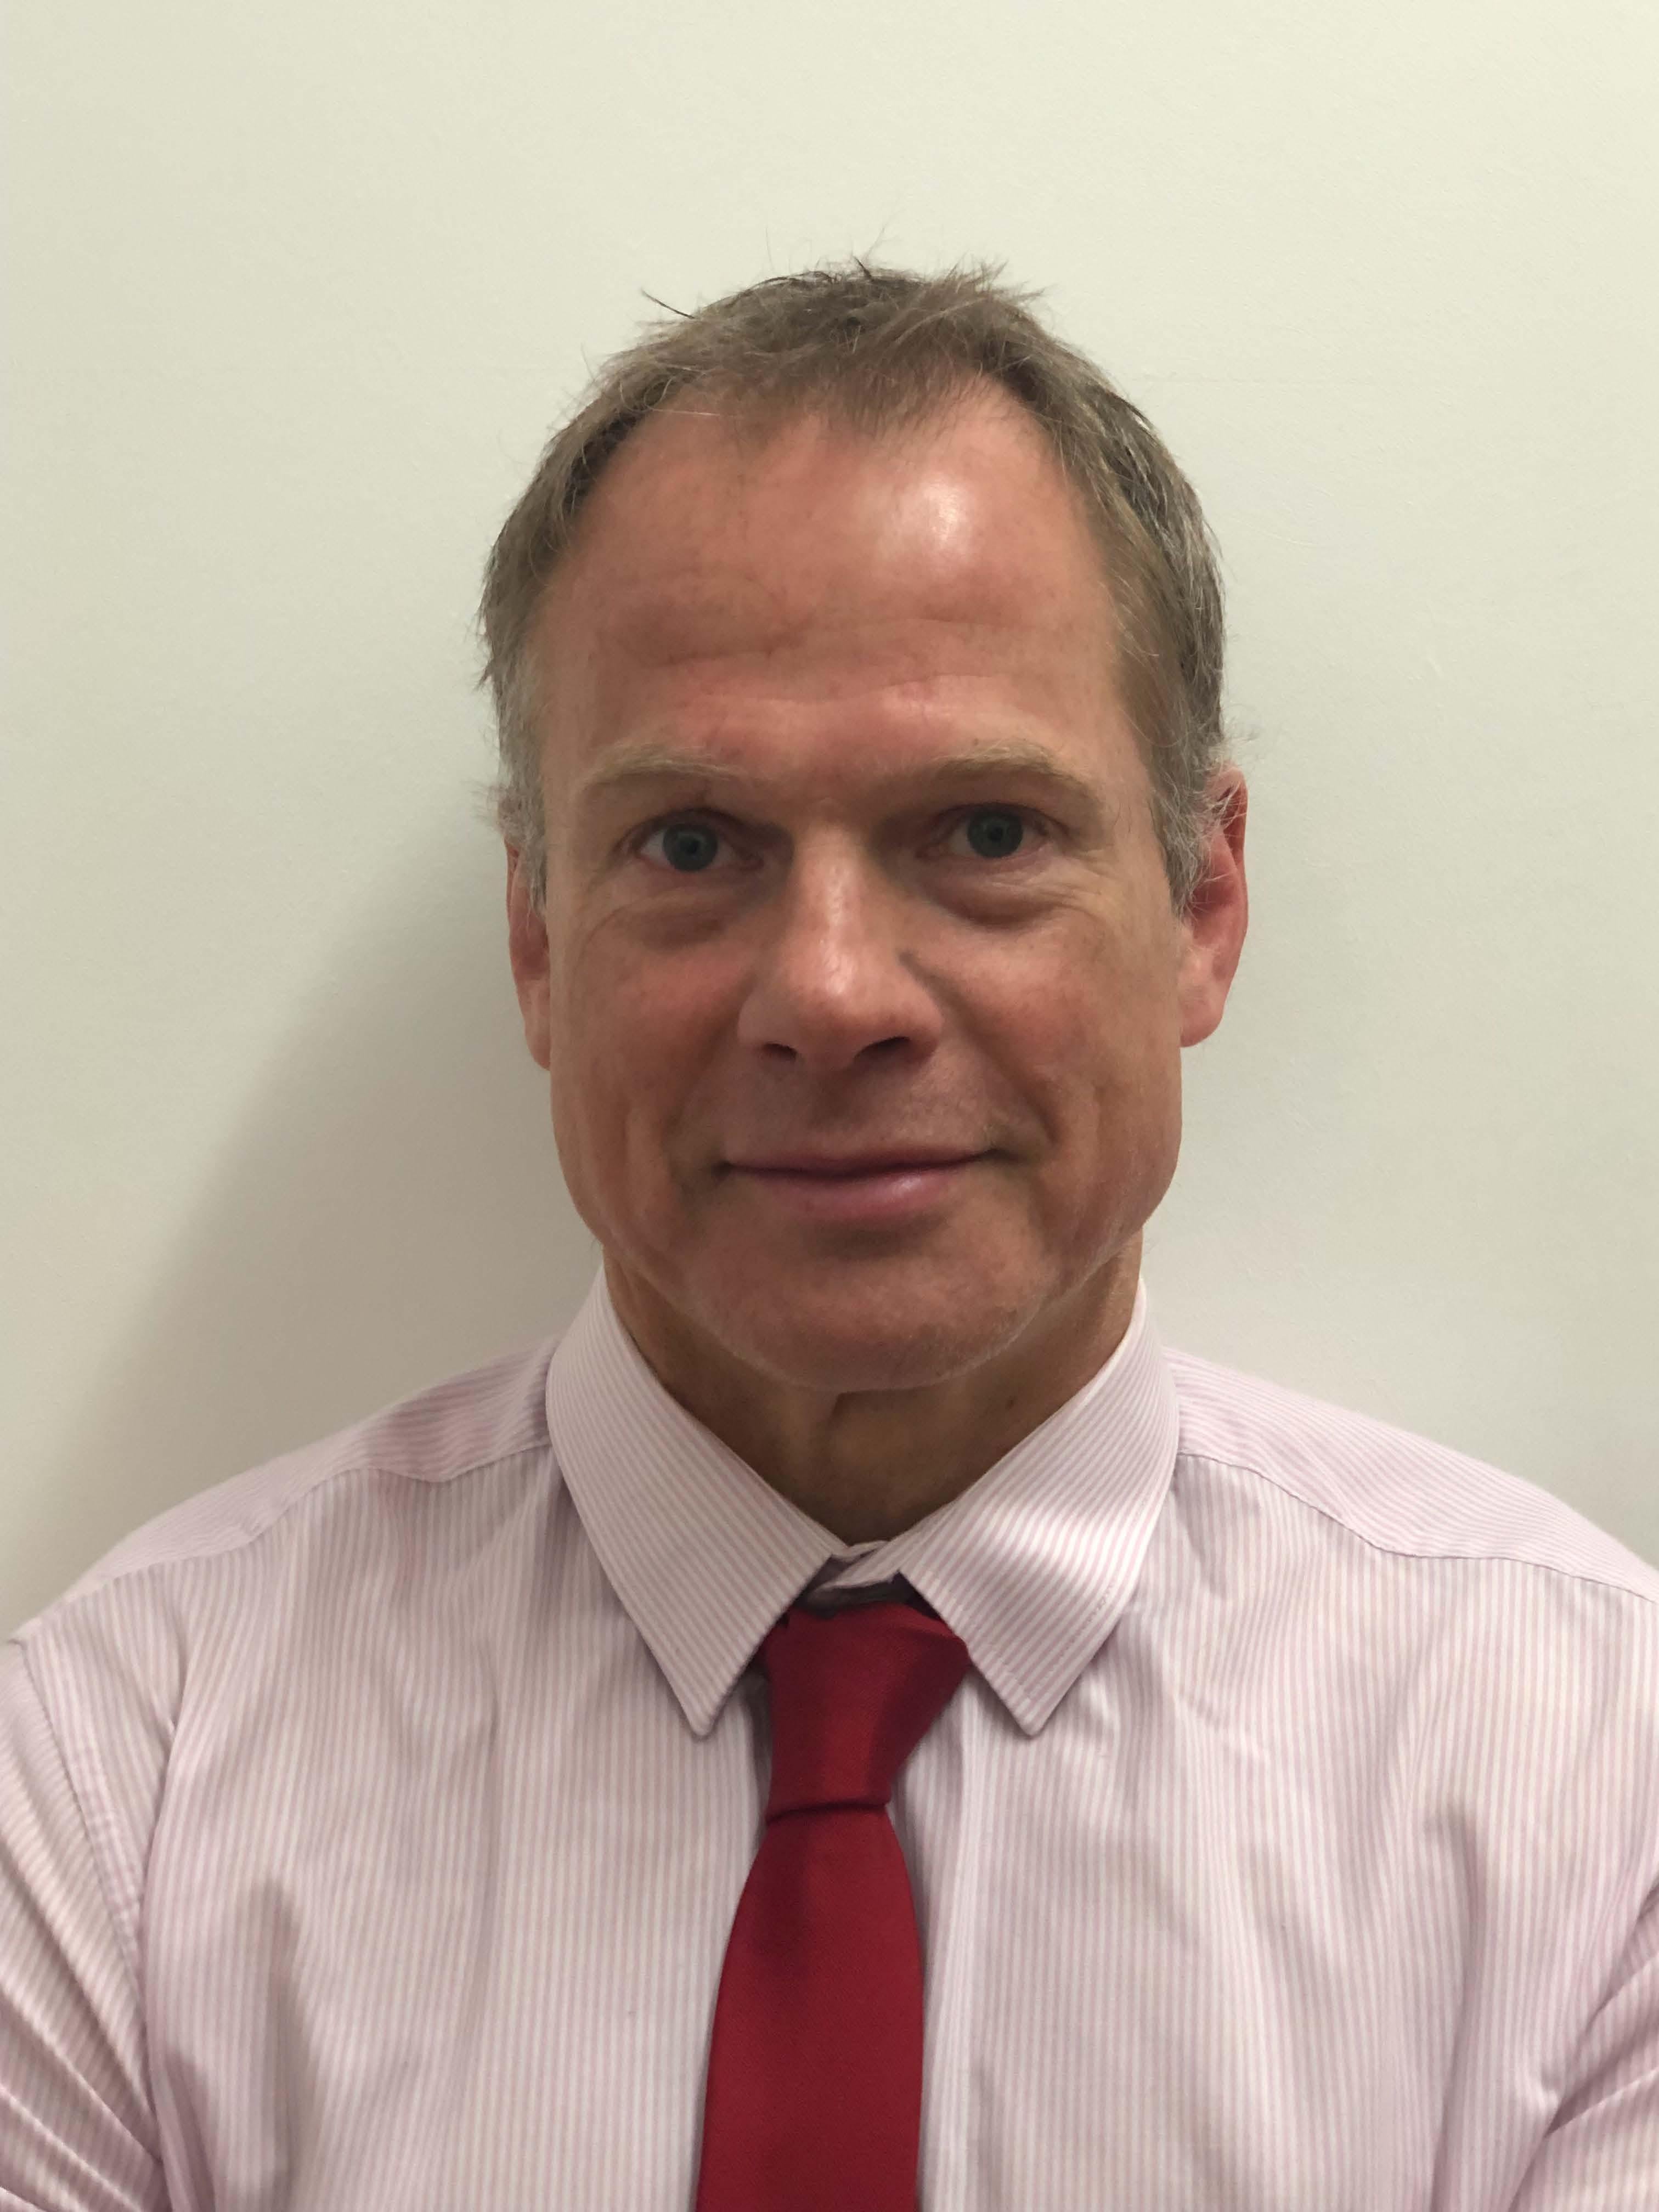 Profile image of Mr A Armitstead